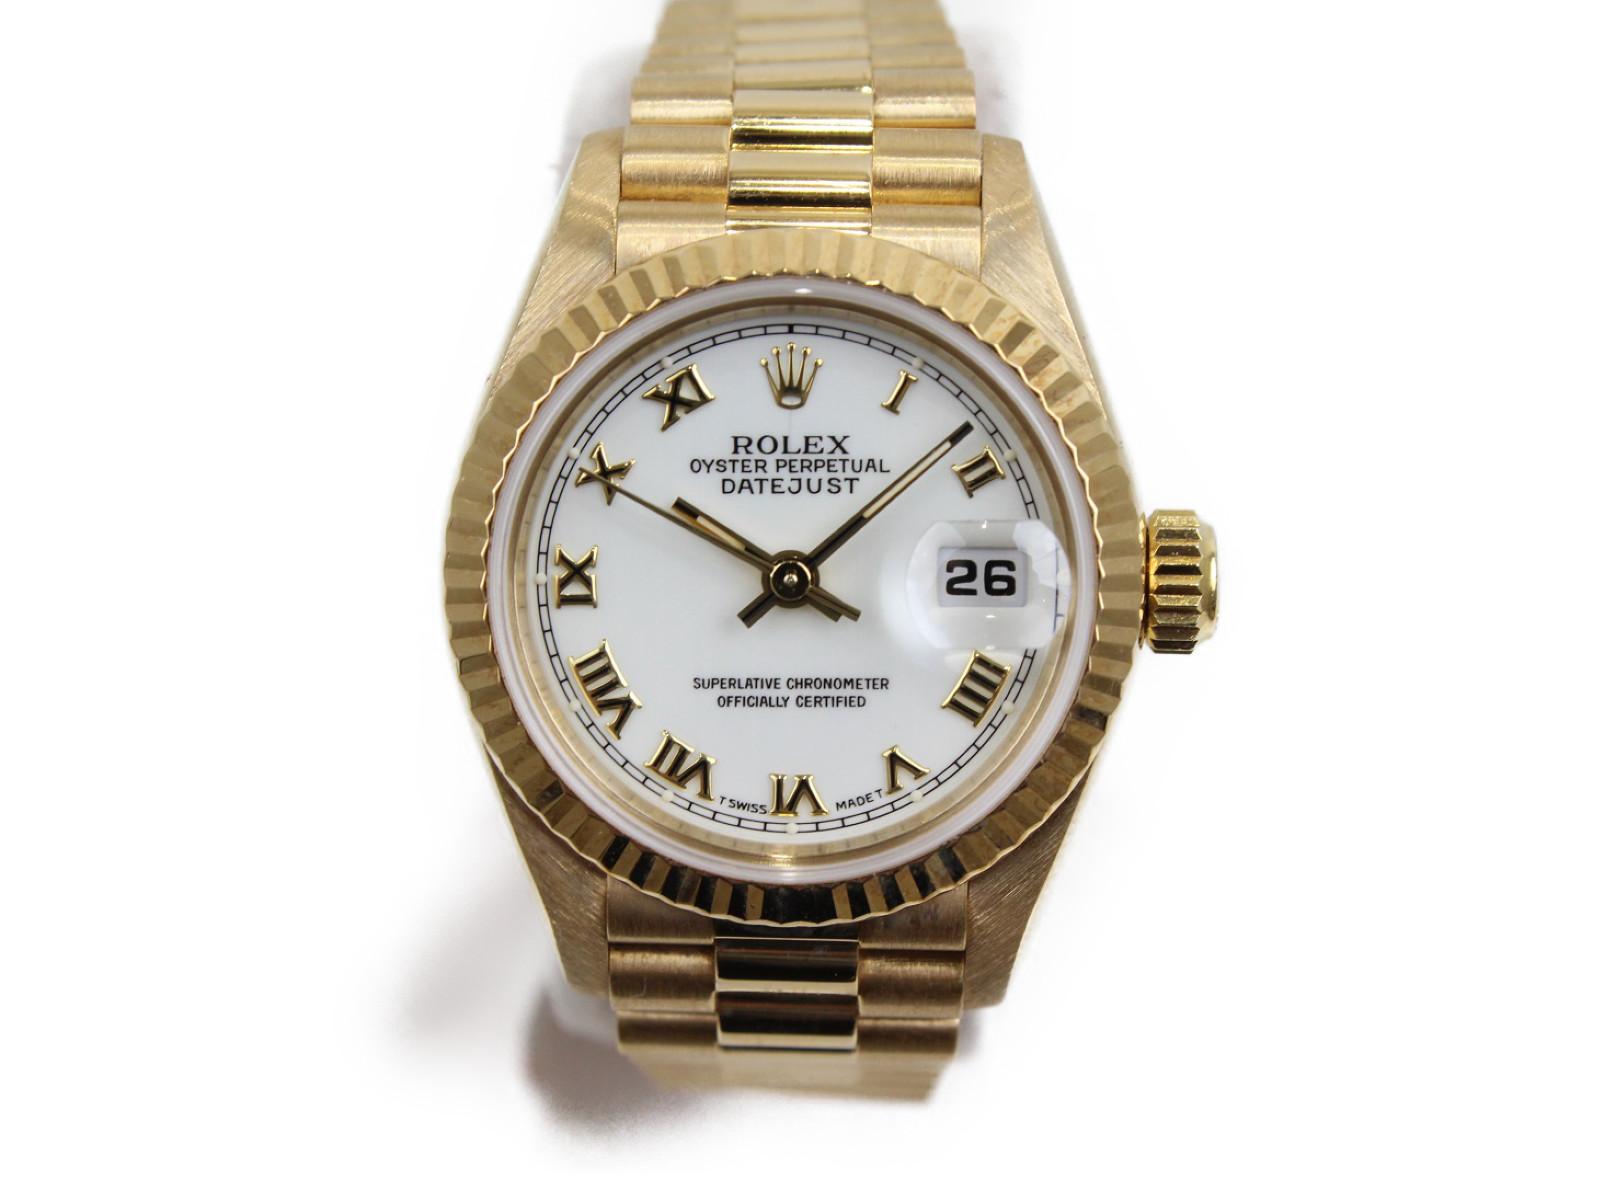 【OH済み】ROLEX ロレックス デイトジャスト 69178 S番 自動巻き デイト K18金無垢 イエローゴールド ホワイト レディース 腕時計【中古】